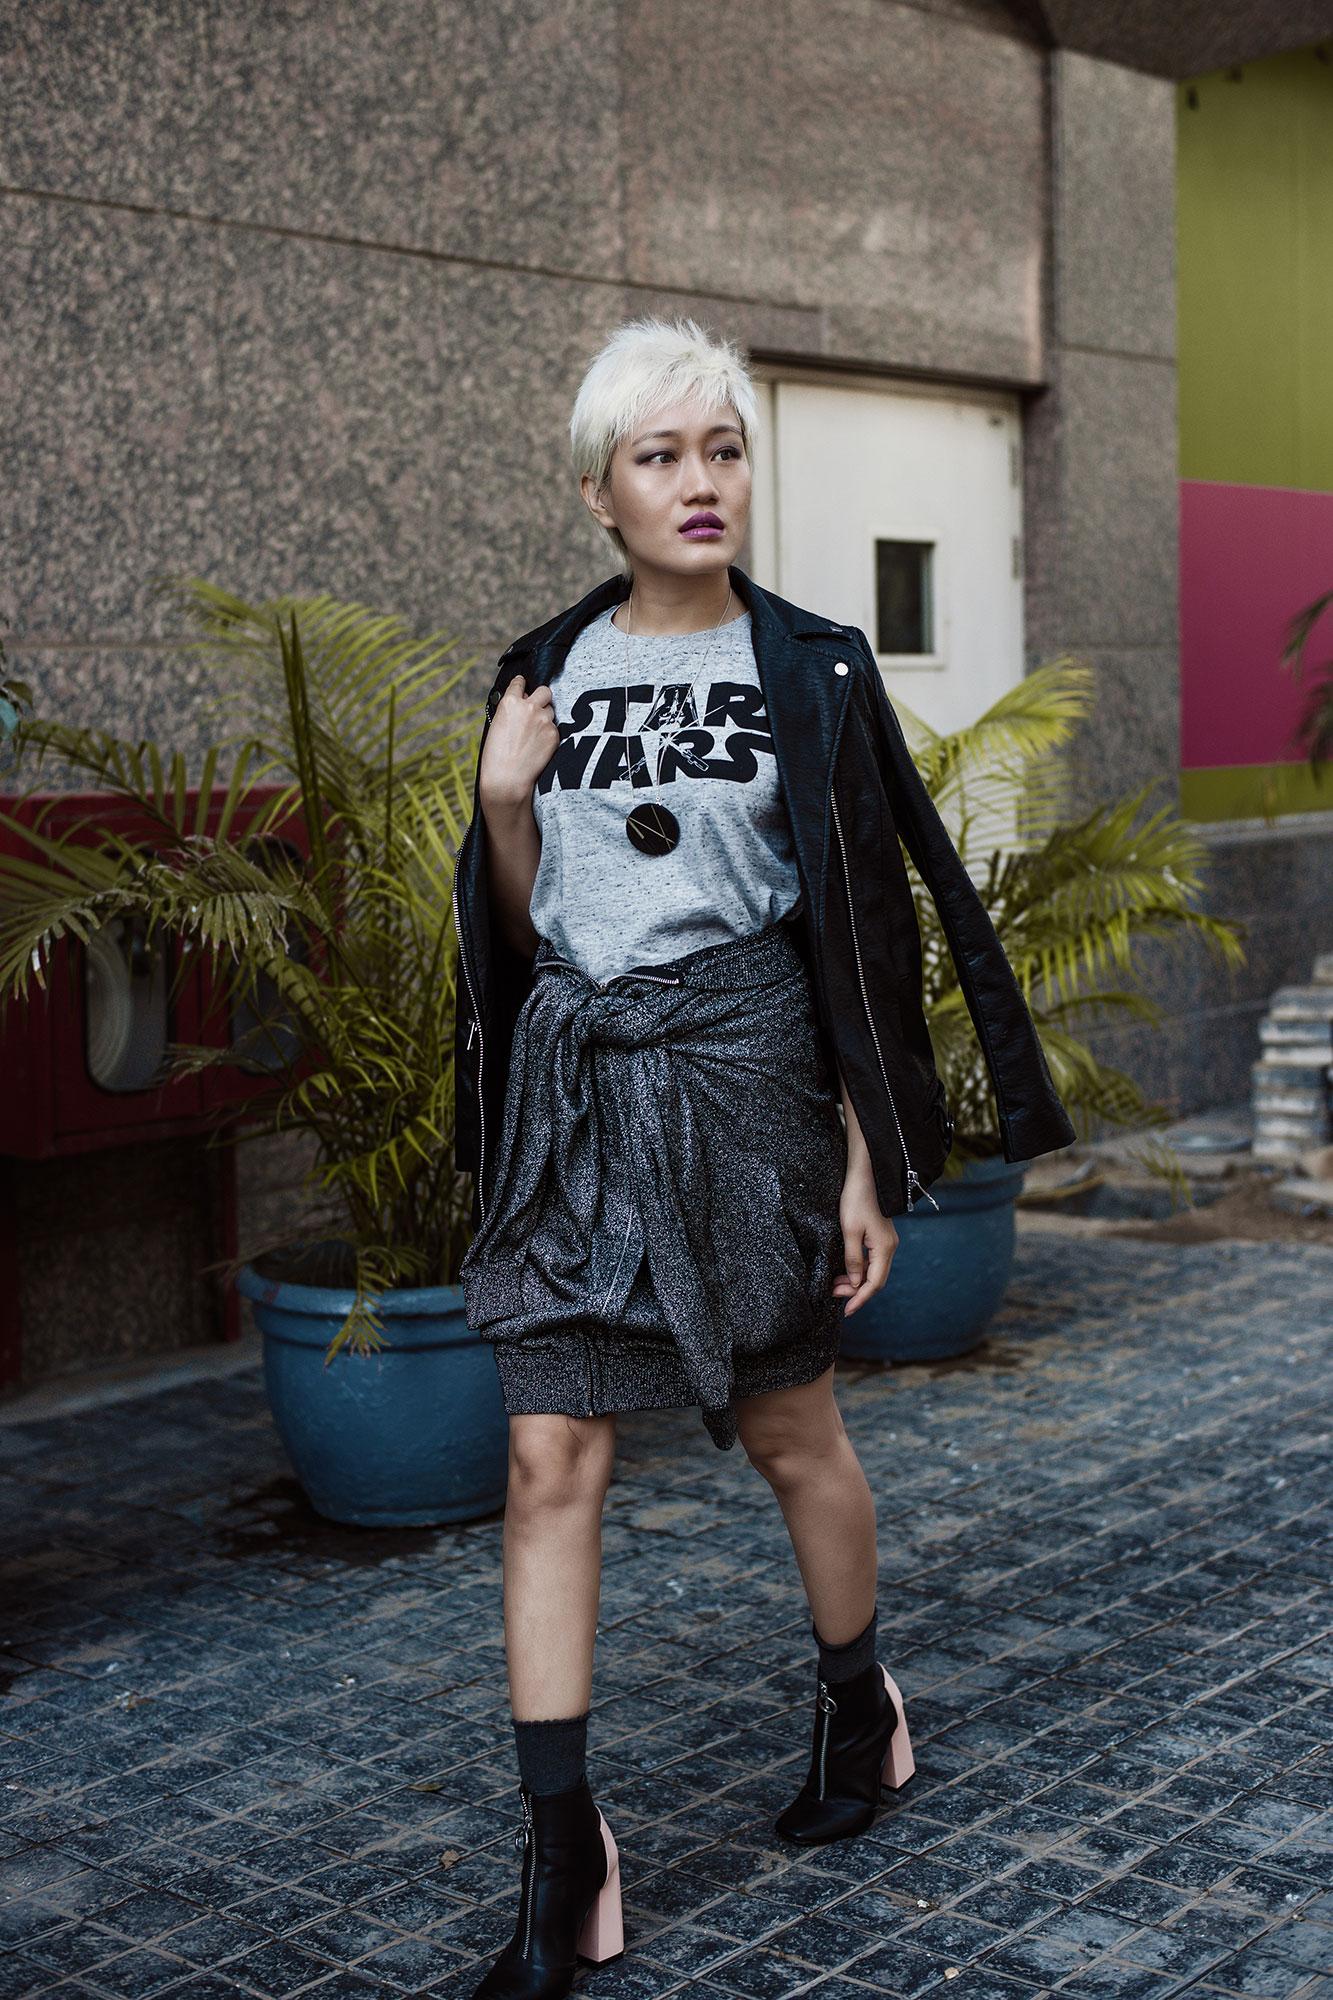 max-fashion-star-wars-collection-aien-jamir-1